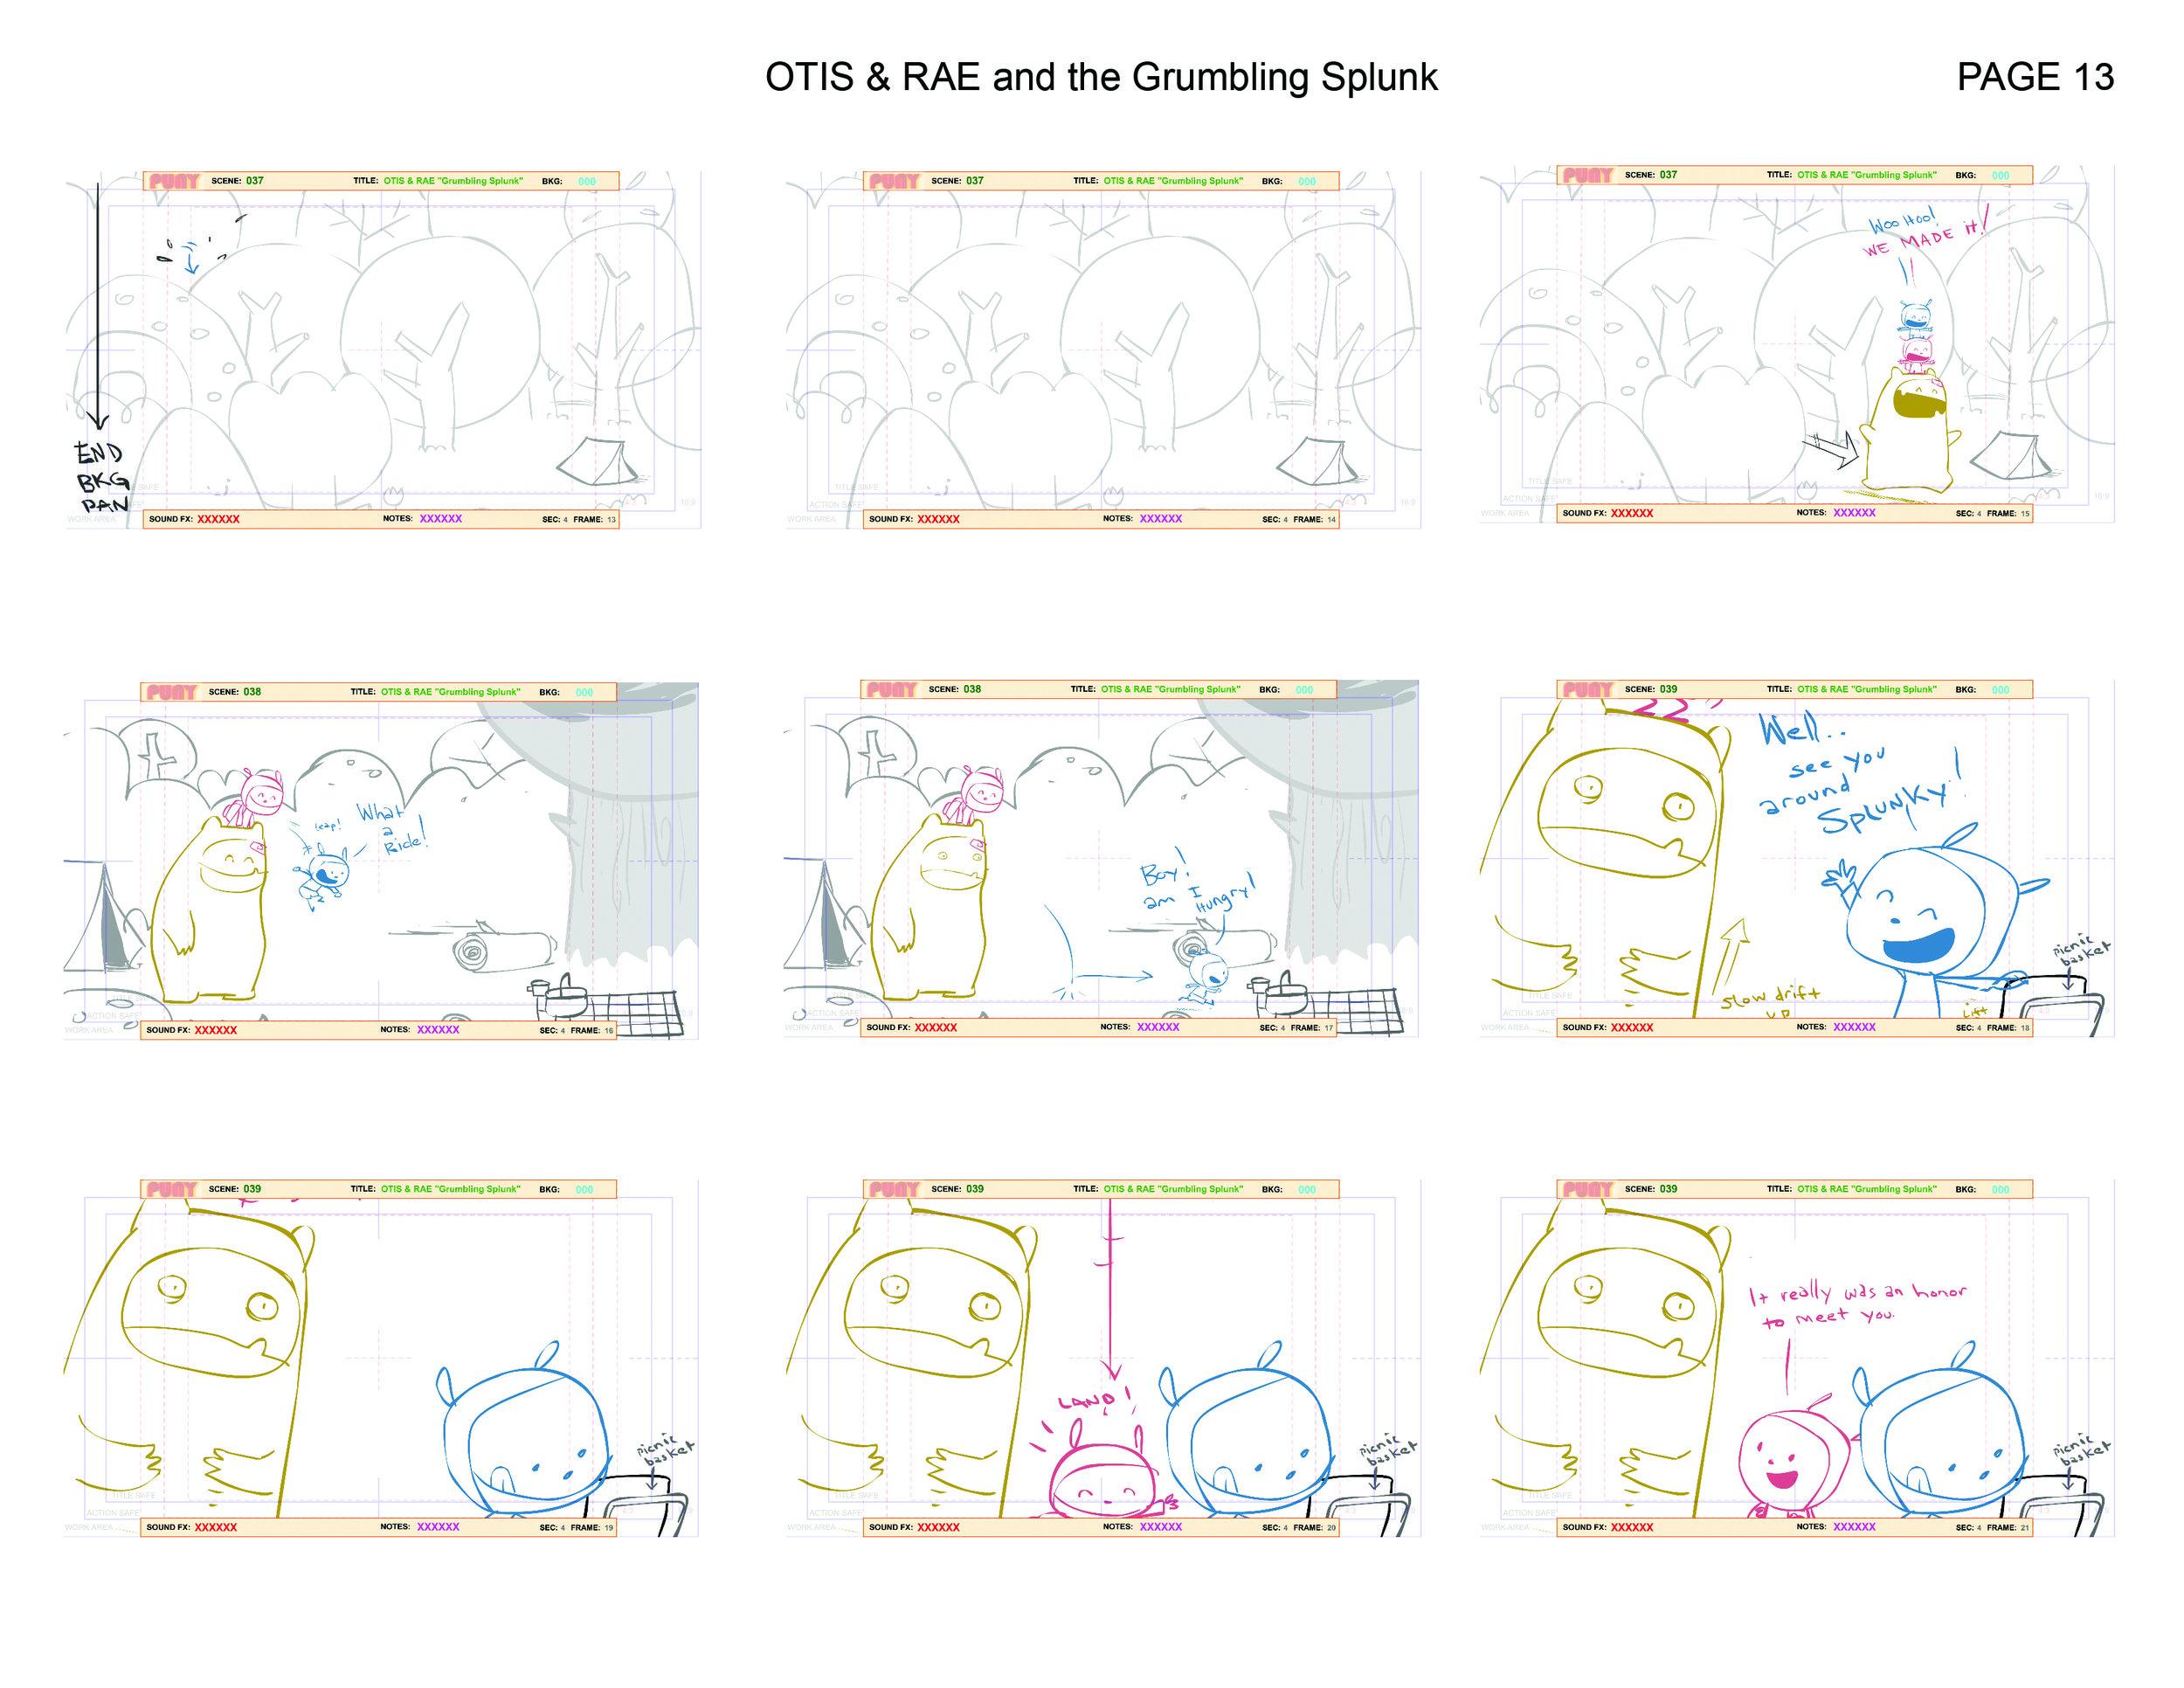 O_R_storyboard_page_13.jpg